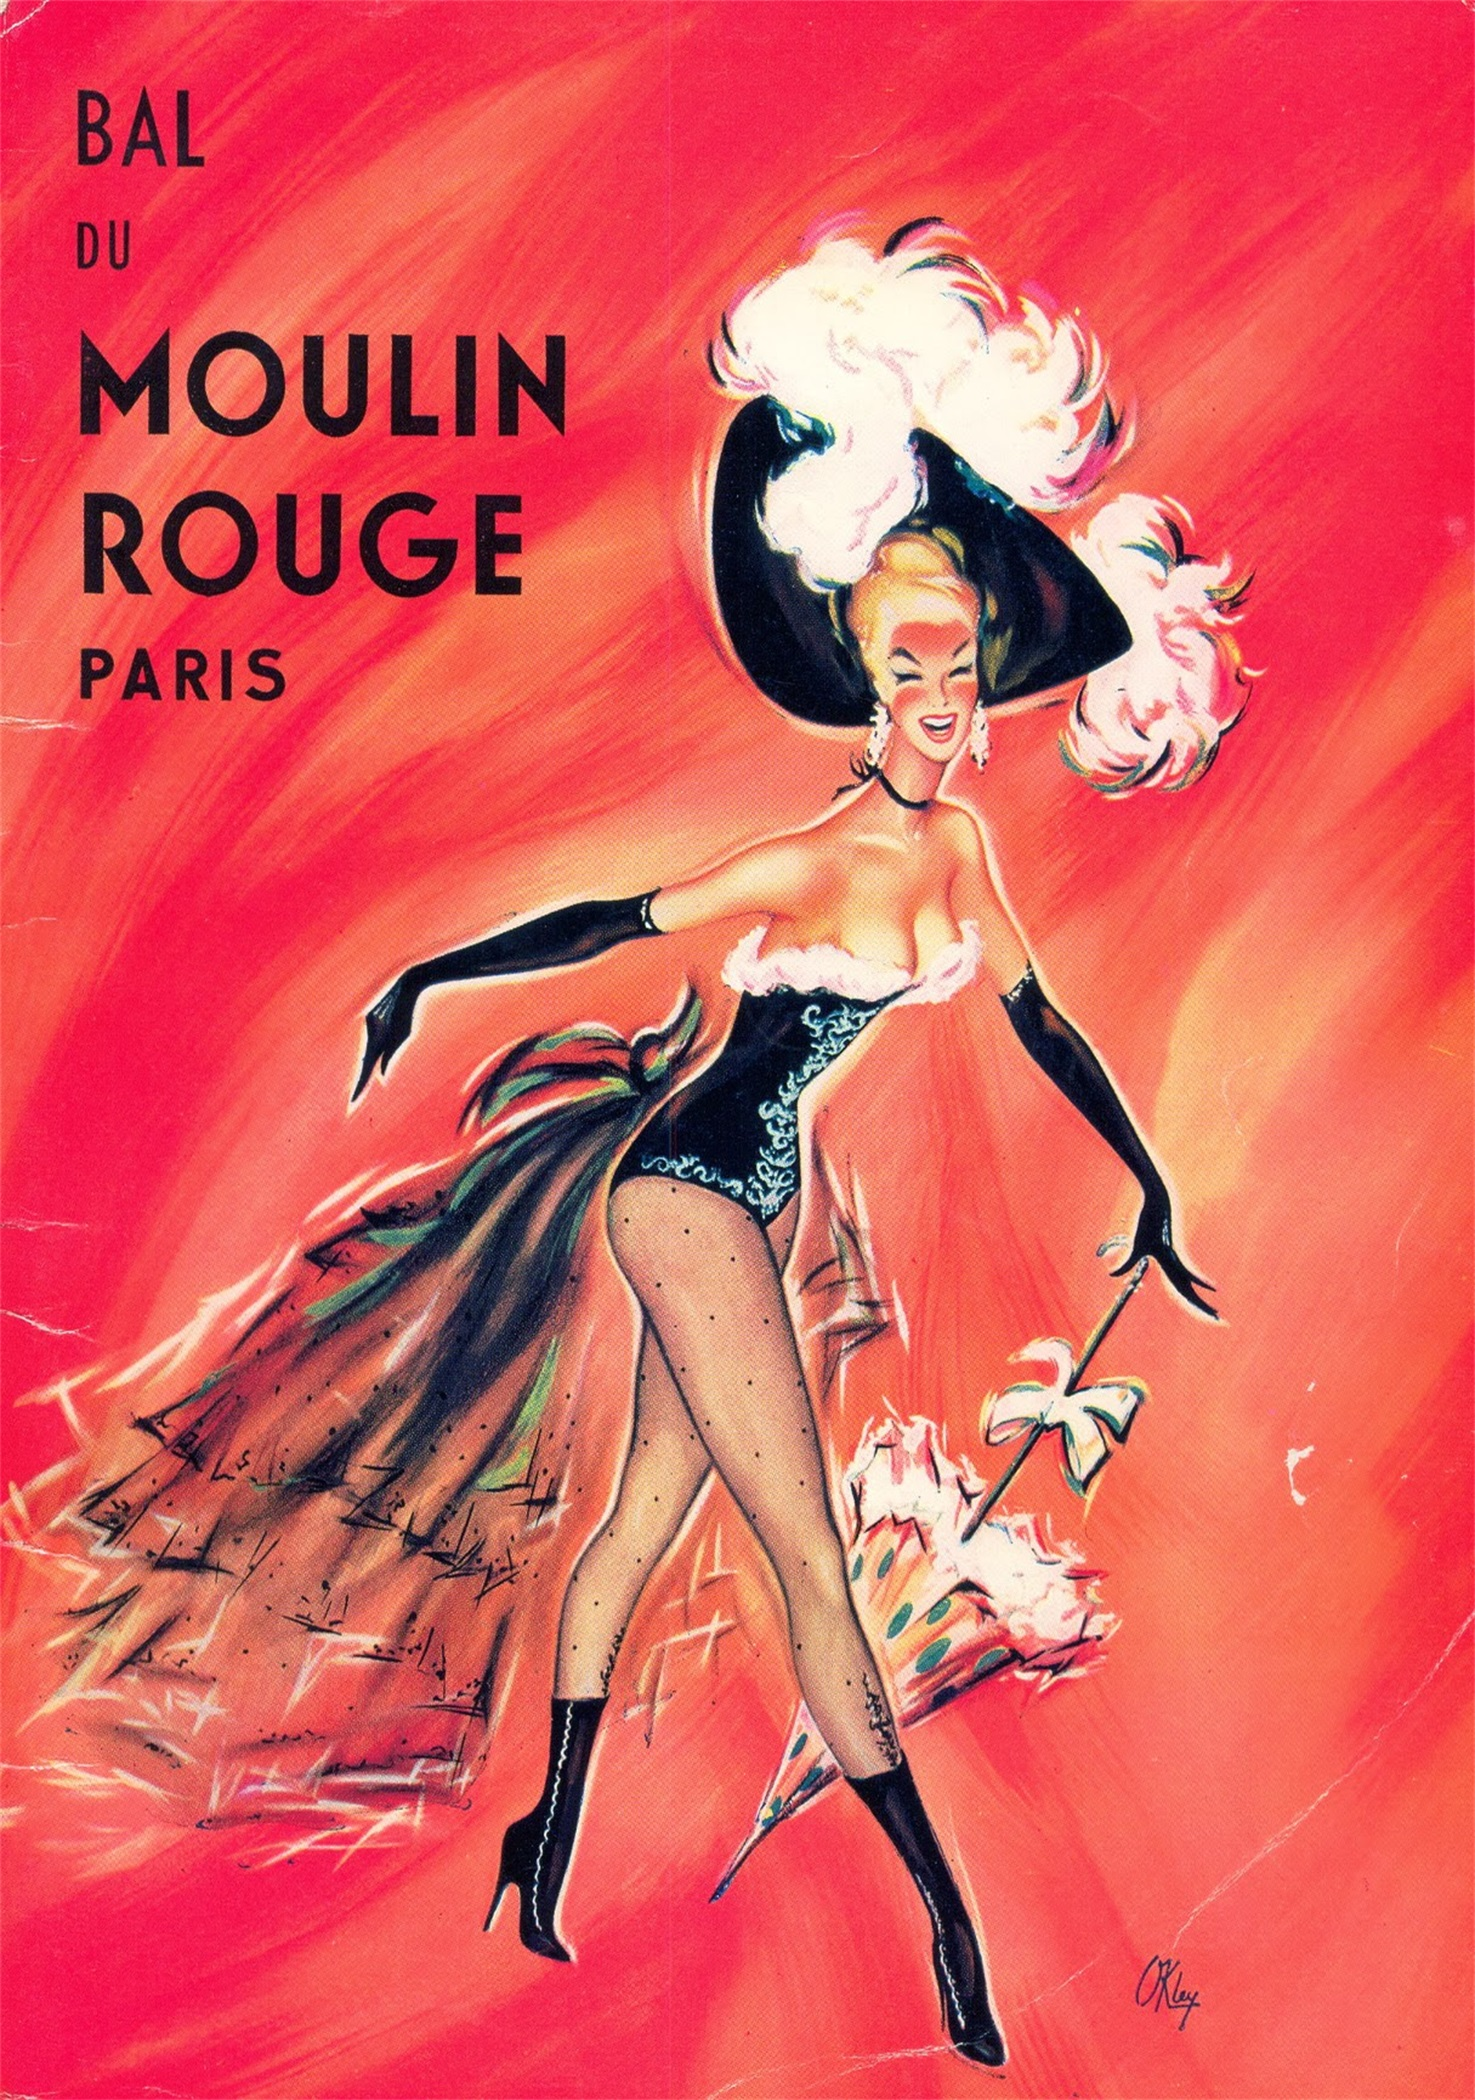 https://ae01.alicdn.com/kf/HTB1zsJvcBDH8KJjSszcq6zDTFXaD/Calendar-Model-Sexy-Pin-Up-Girl-Pop-Art-Propaganda-Retro-Vintage-Kraft-Poster-Canvas-DIY-Wall.jpg